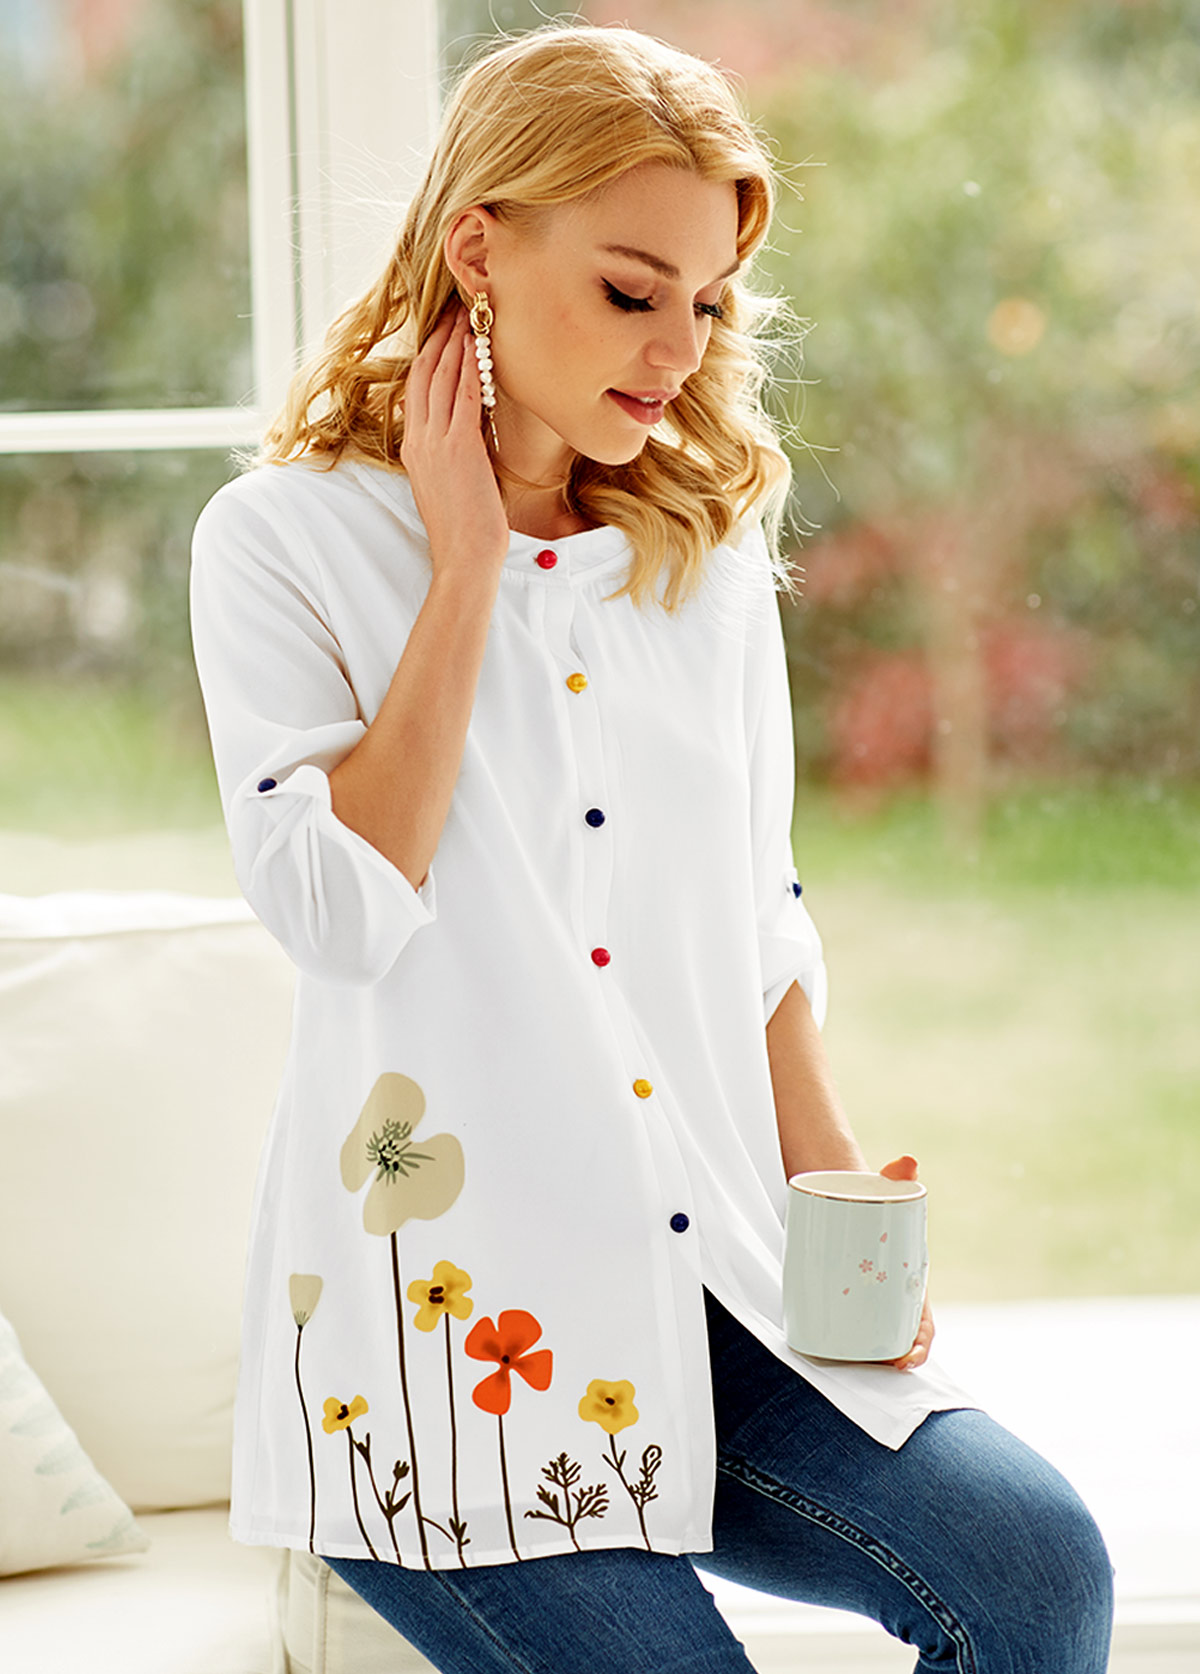 Floral Print Colorful Button White Blouse